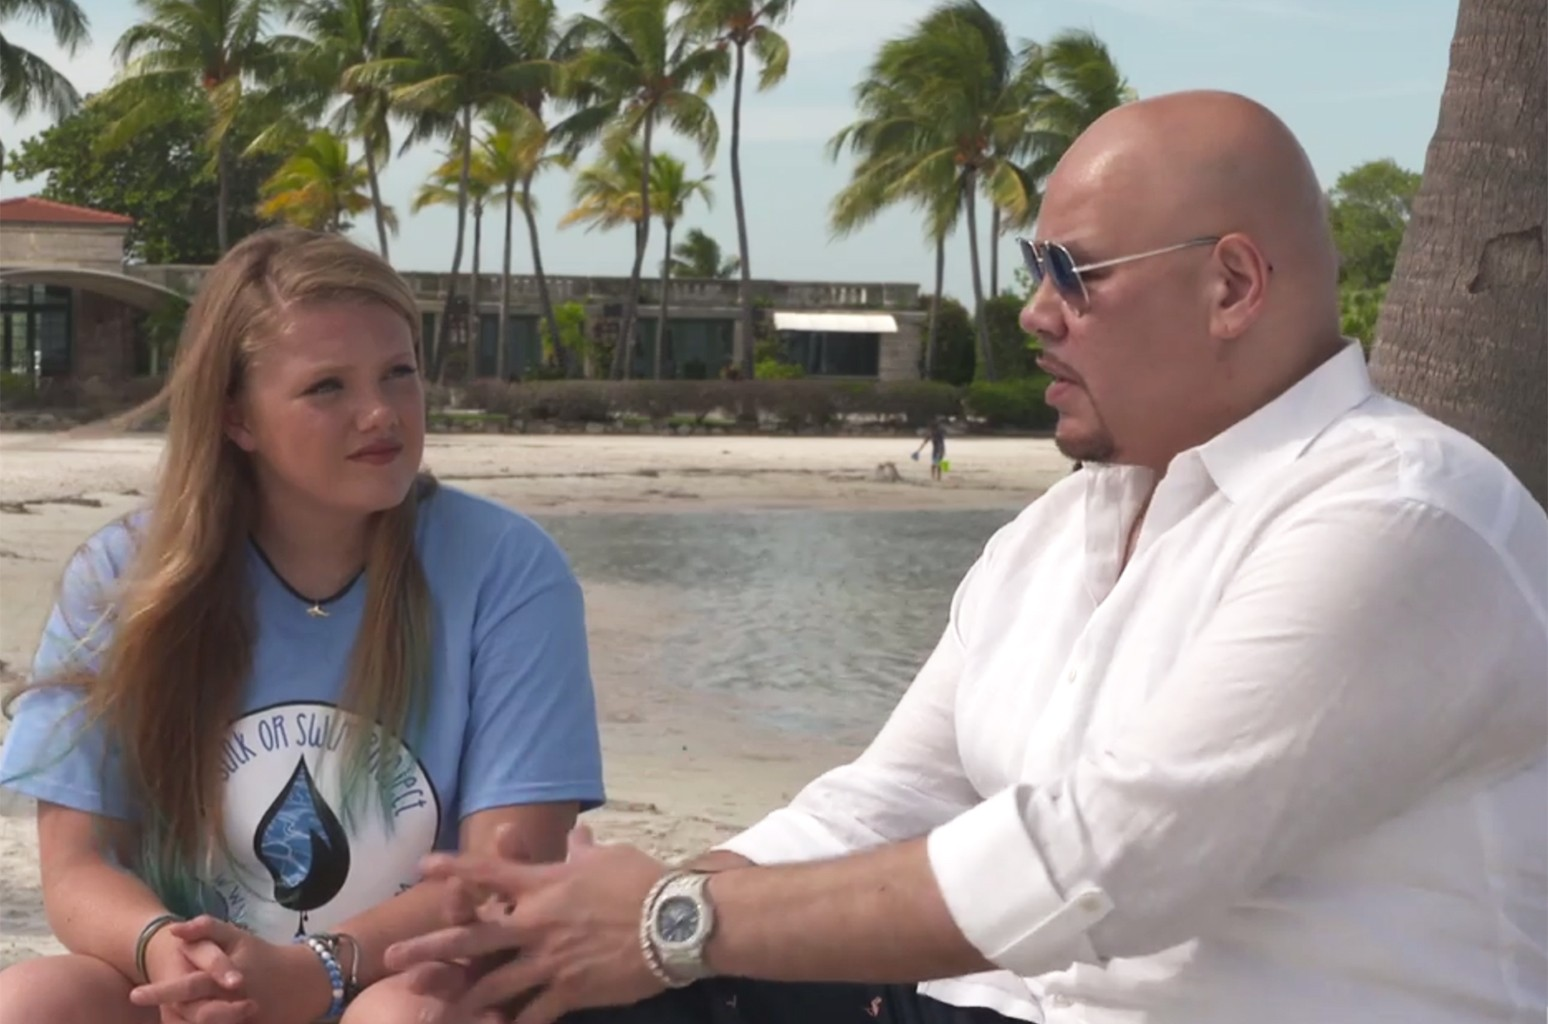 Fat Joe in MTV's An Inconvenient Special